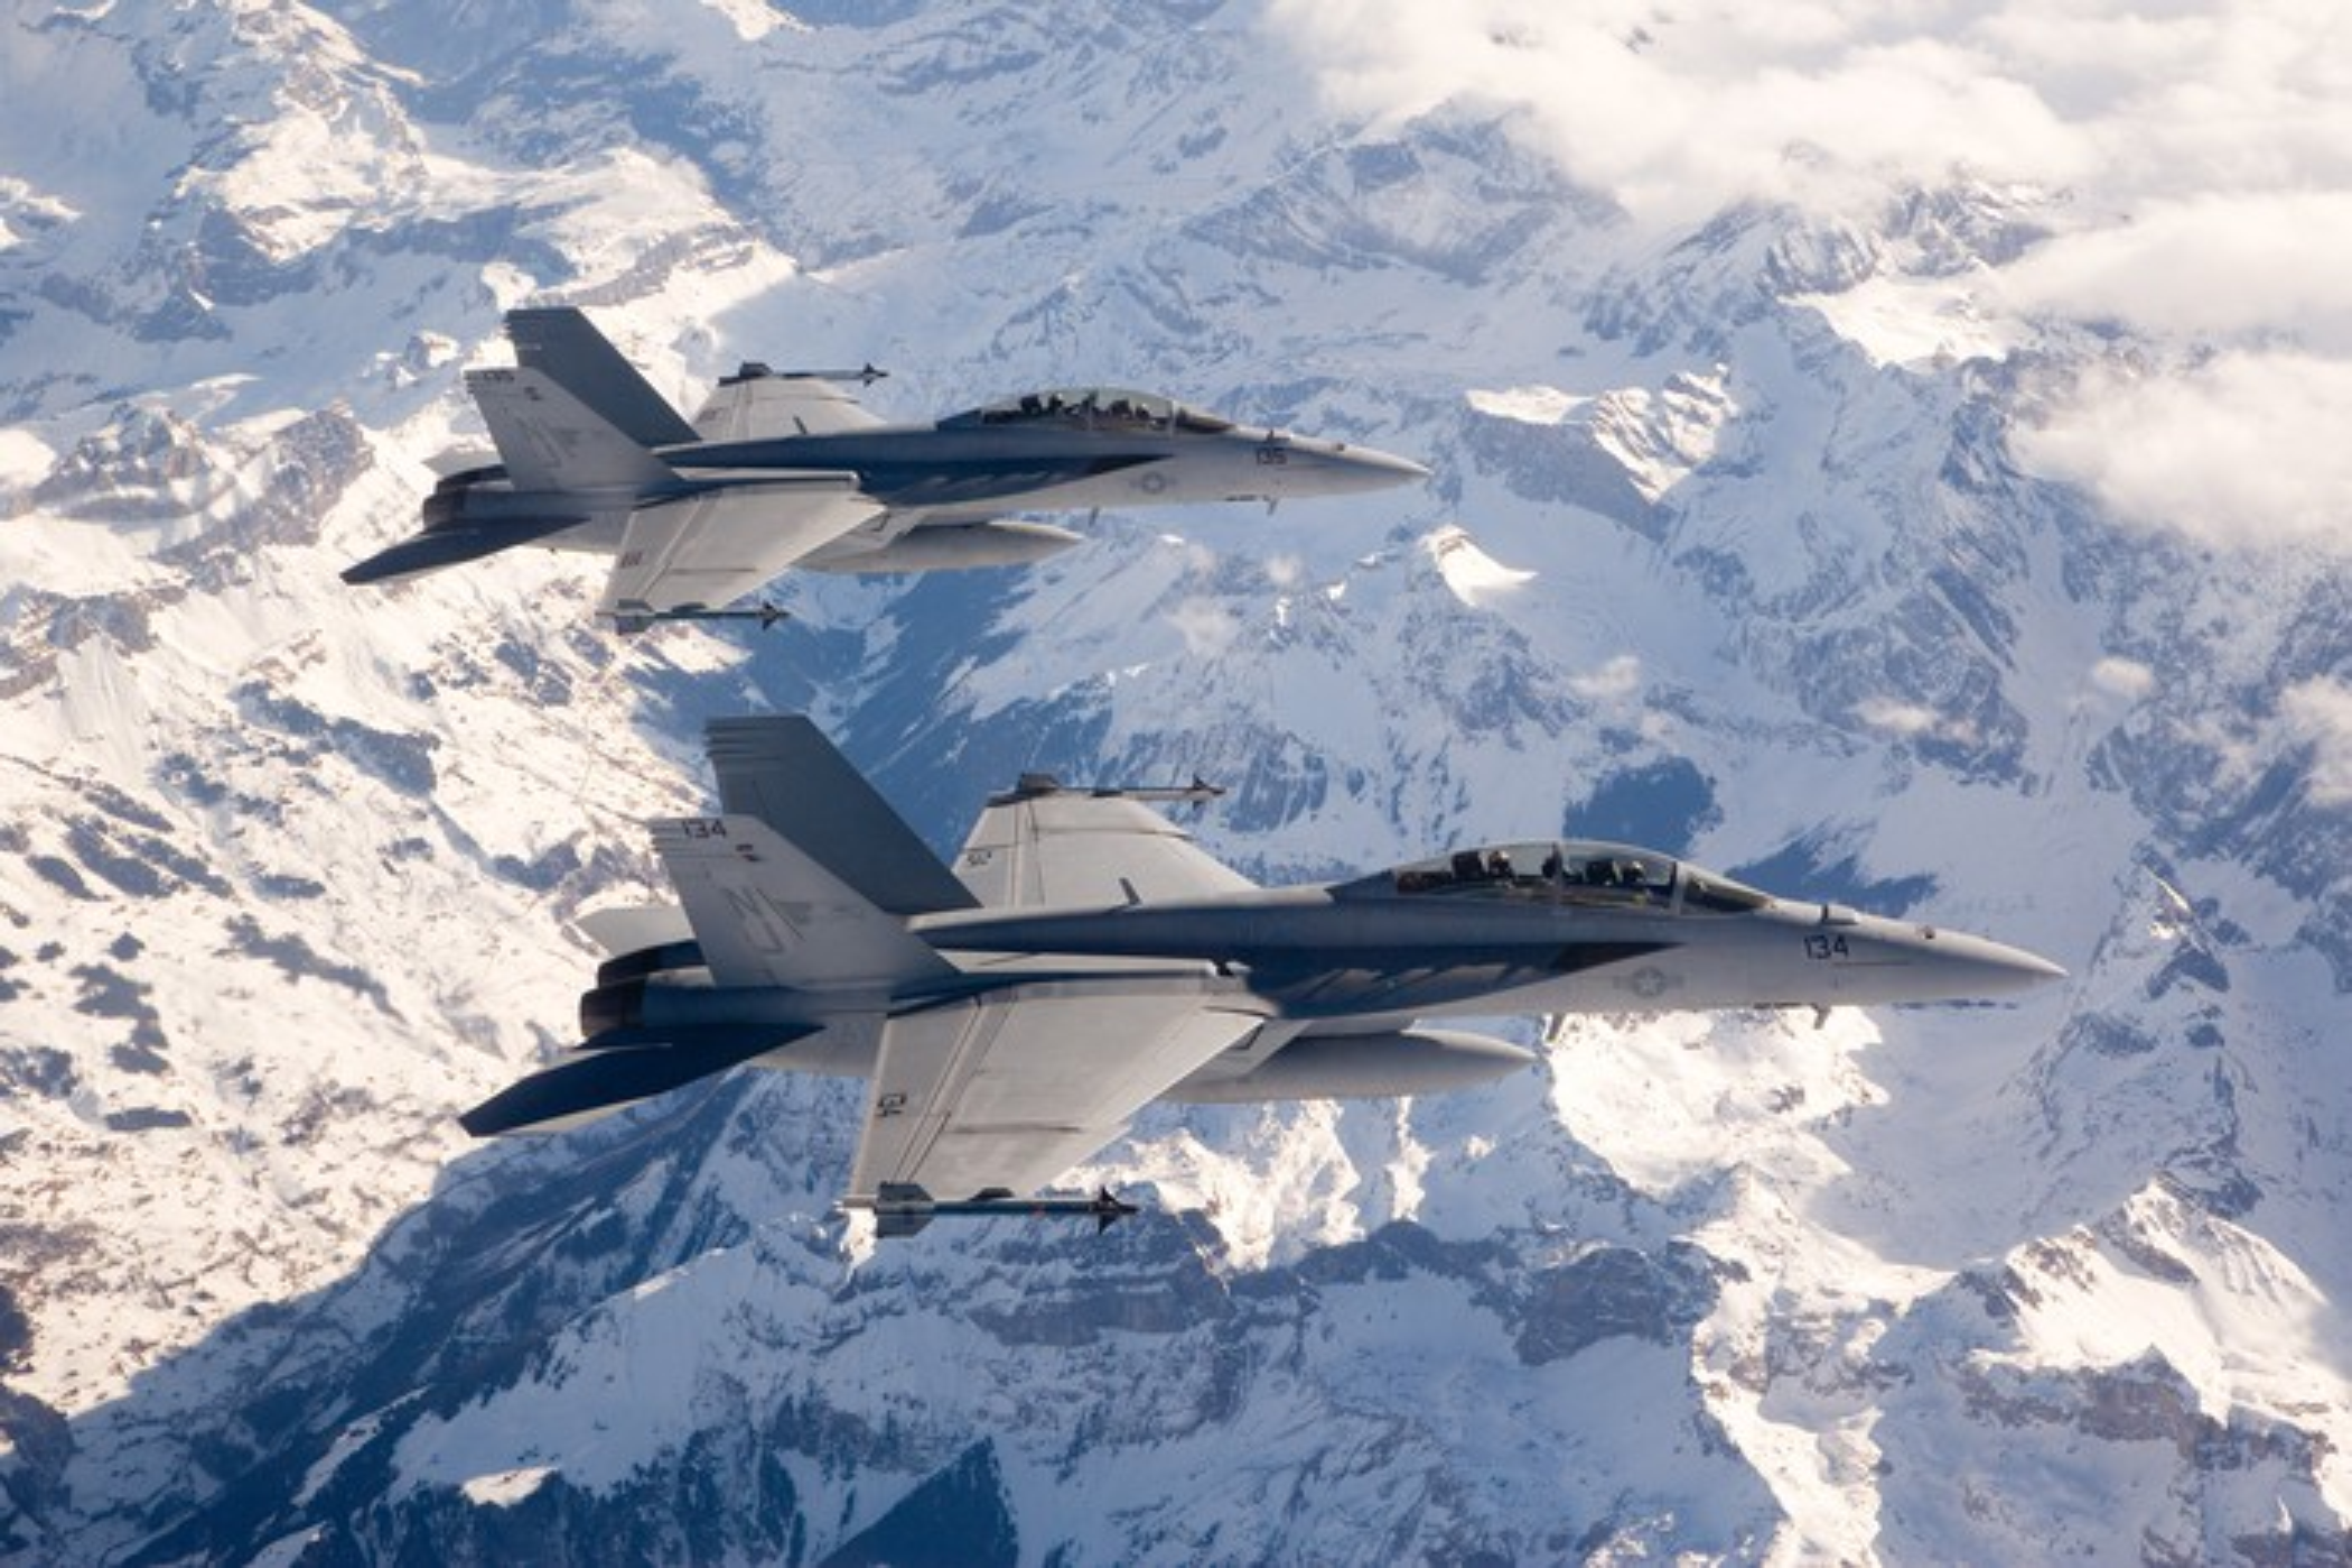 Boeing-made F-18 Super Hornets in flight